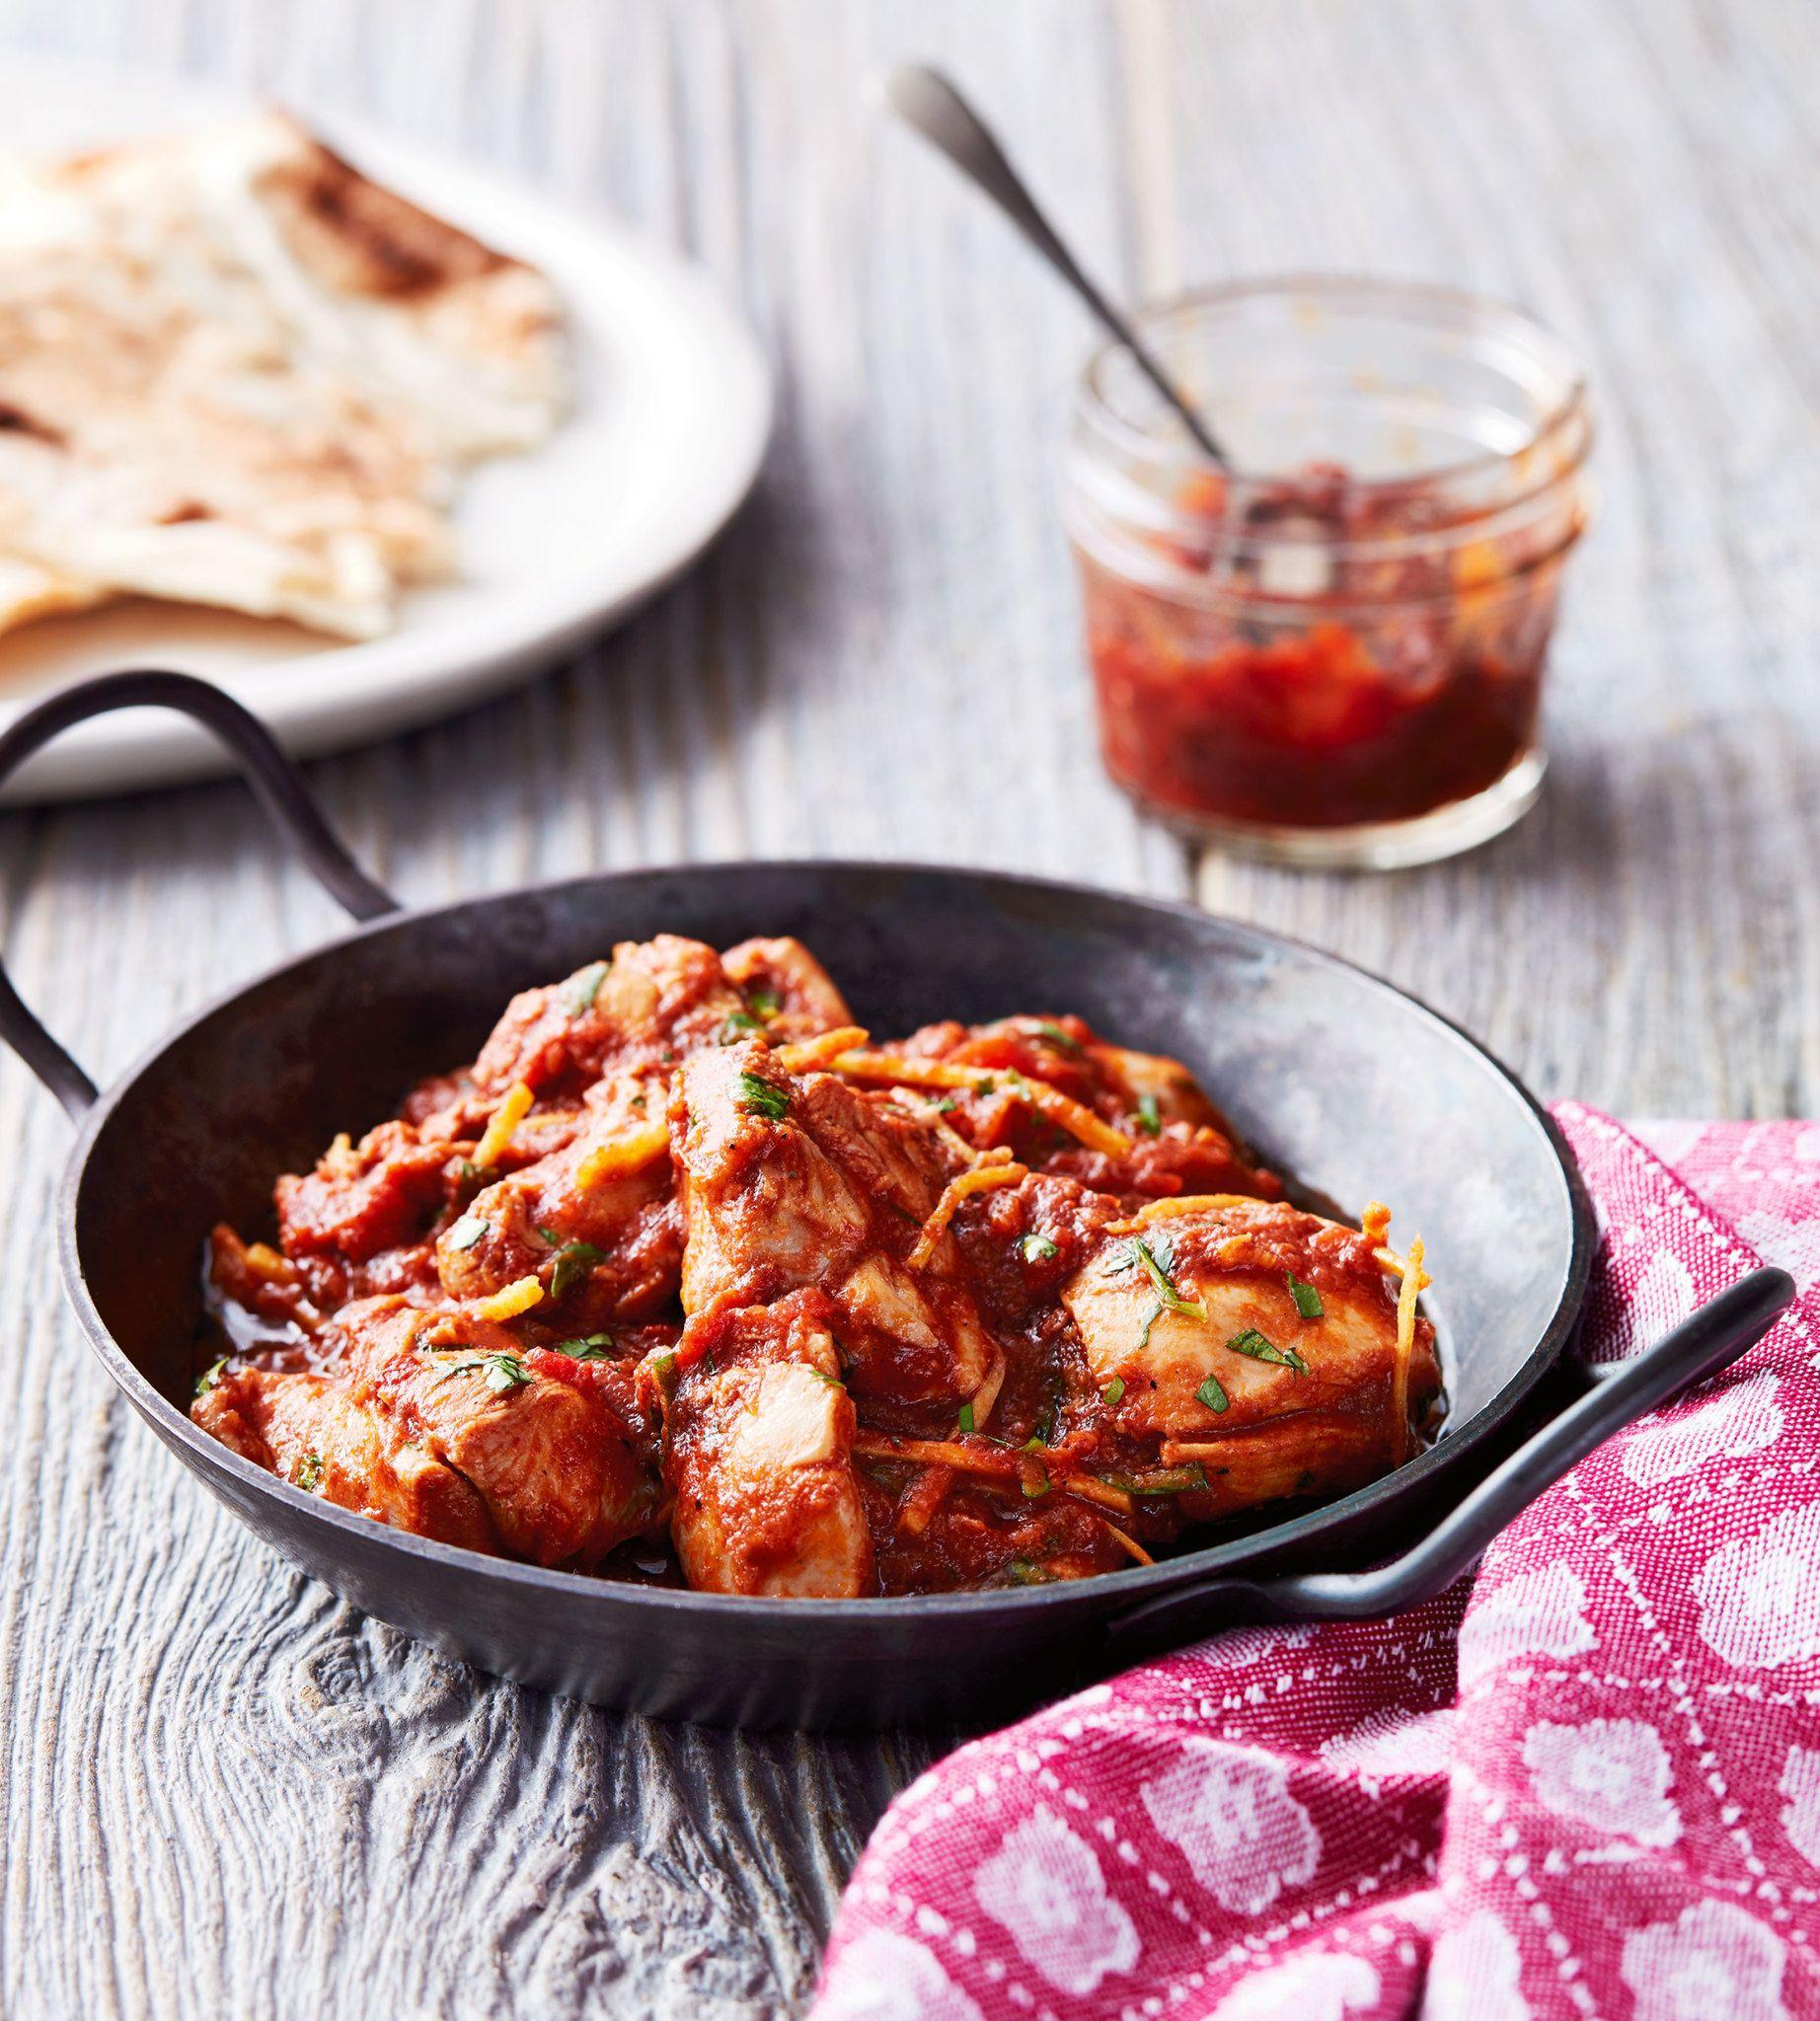 Karahi Chicken Instant Pot Recipes Recipe Instant Pot Recipes Pot Recipes Recipes